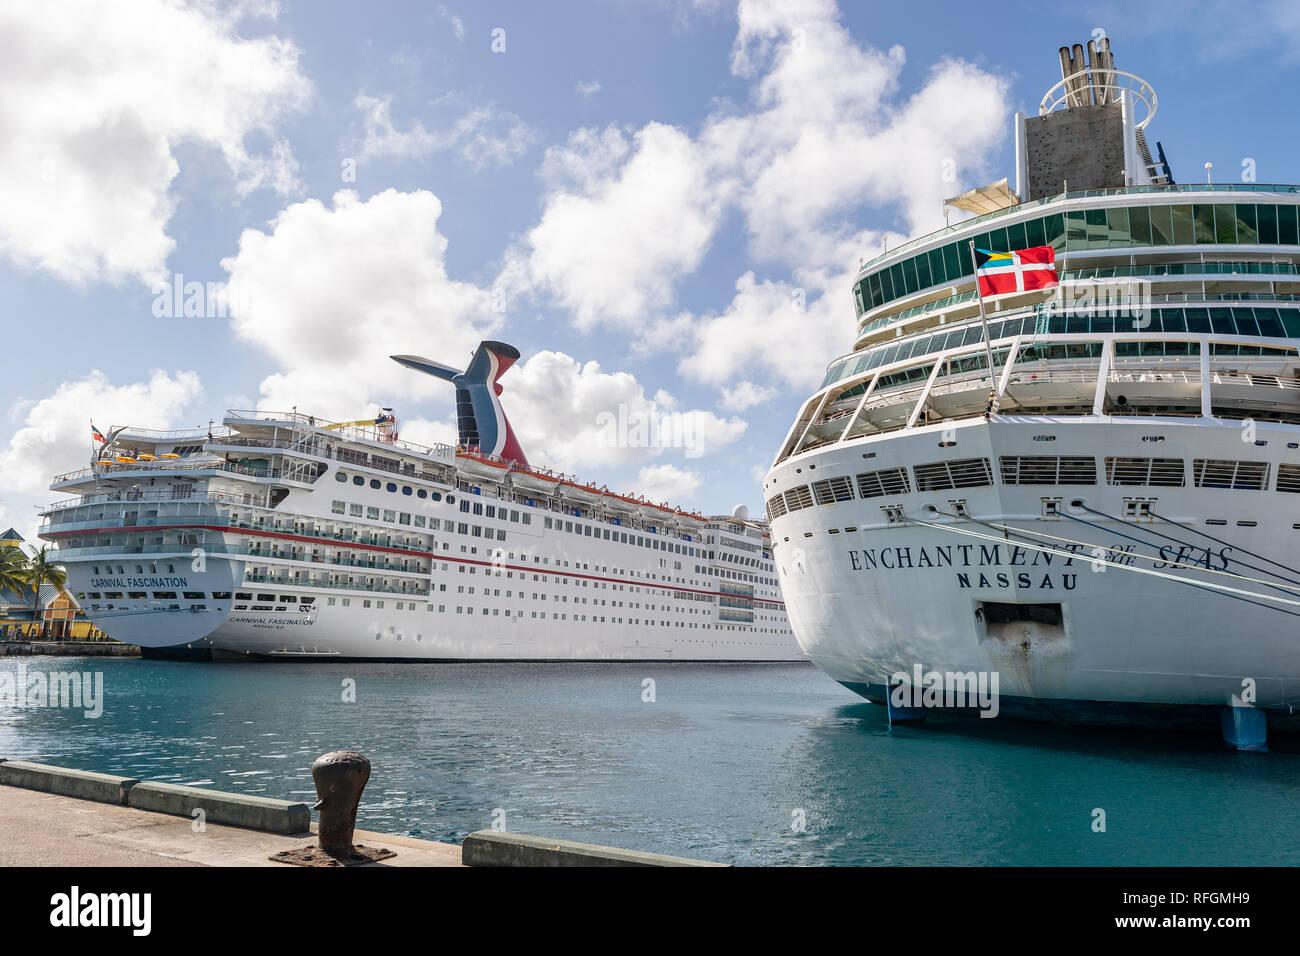 Nassau, Bahamas - December 02 2015: Carnival Fascination and Royal Caribbean Enchantment of the Seas cruise ships moored at the Cruise Port - Stock Image